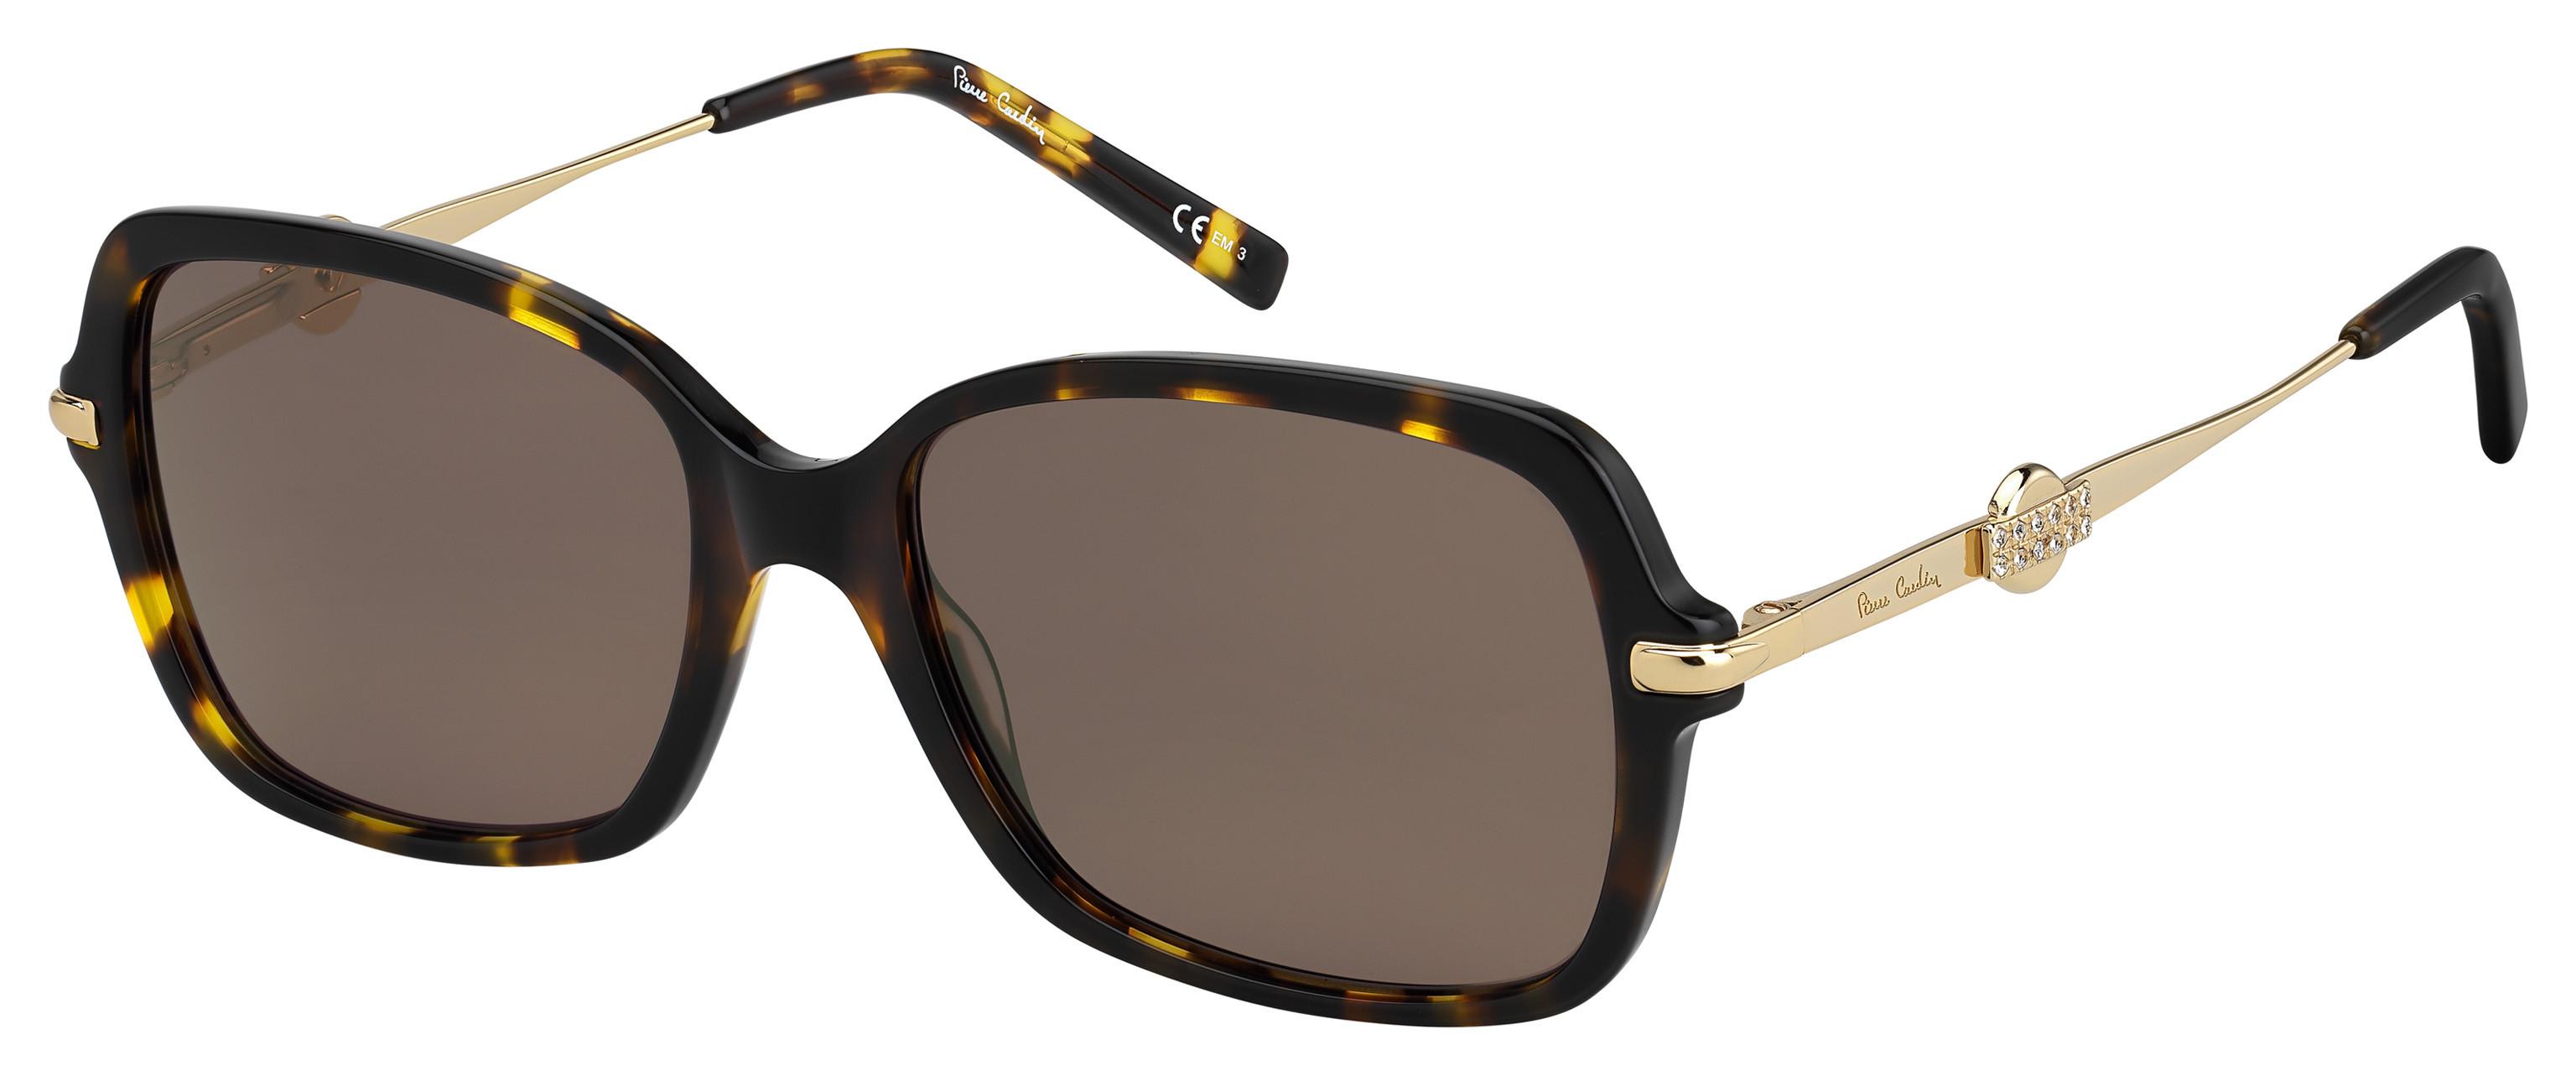 Gafas de sol PIERRE CARDIN PC 8474 08670